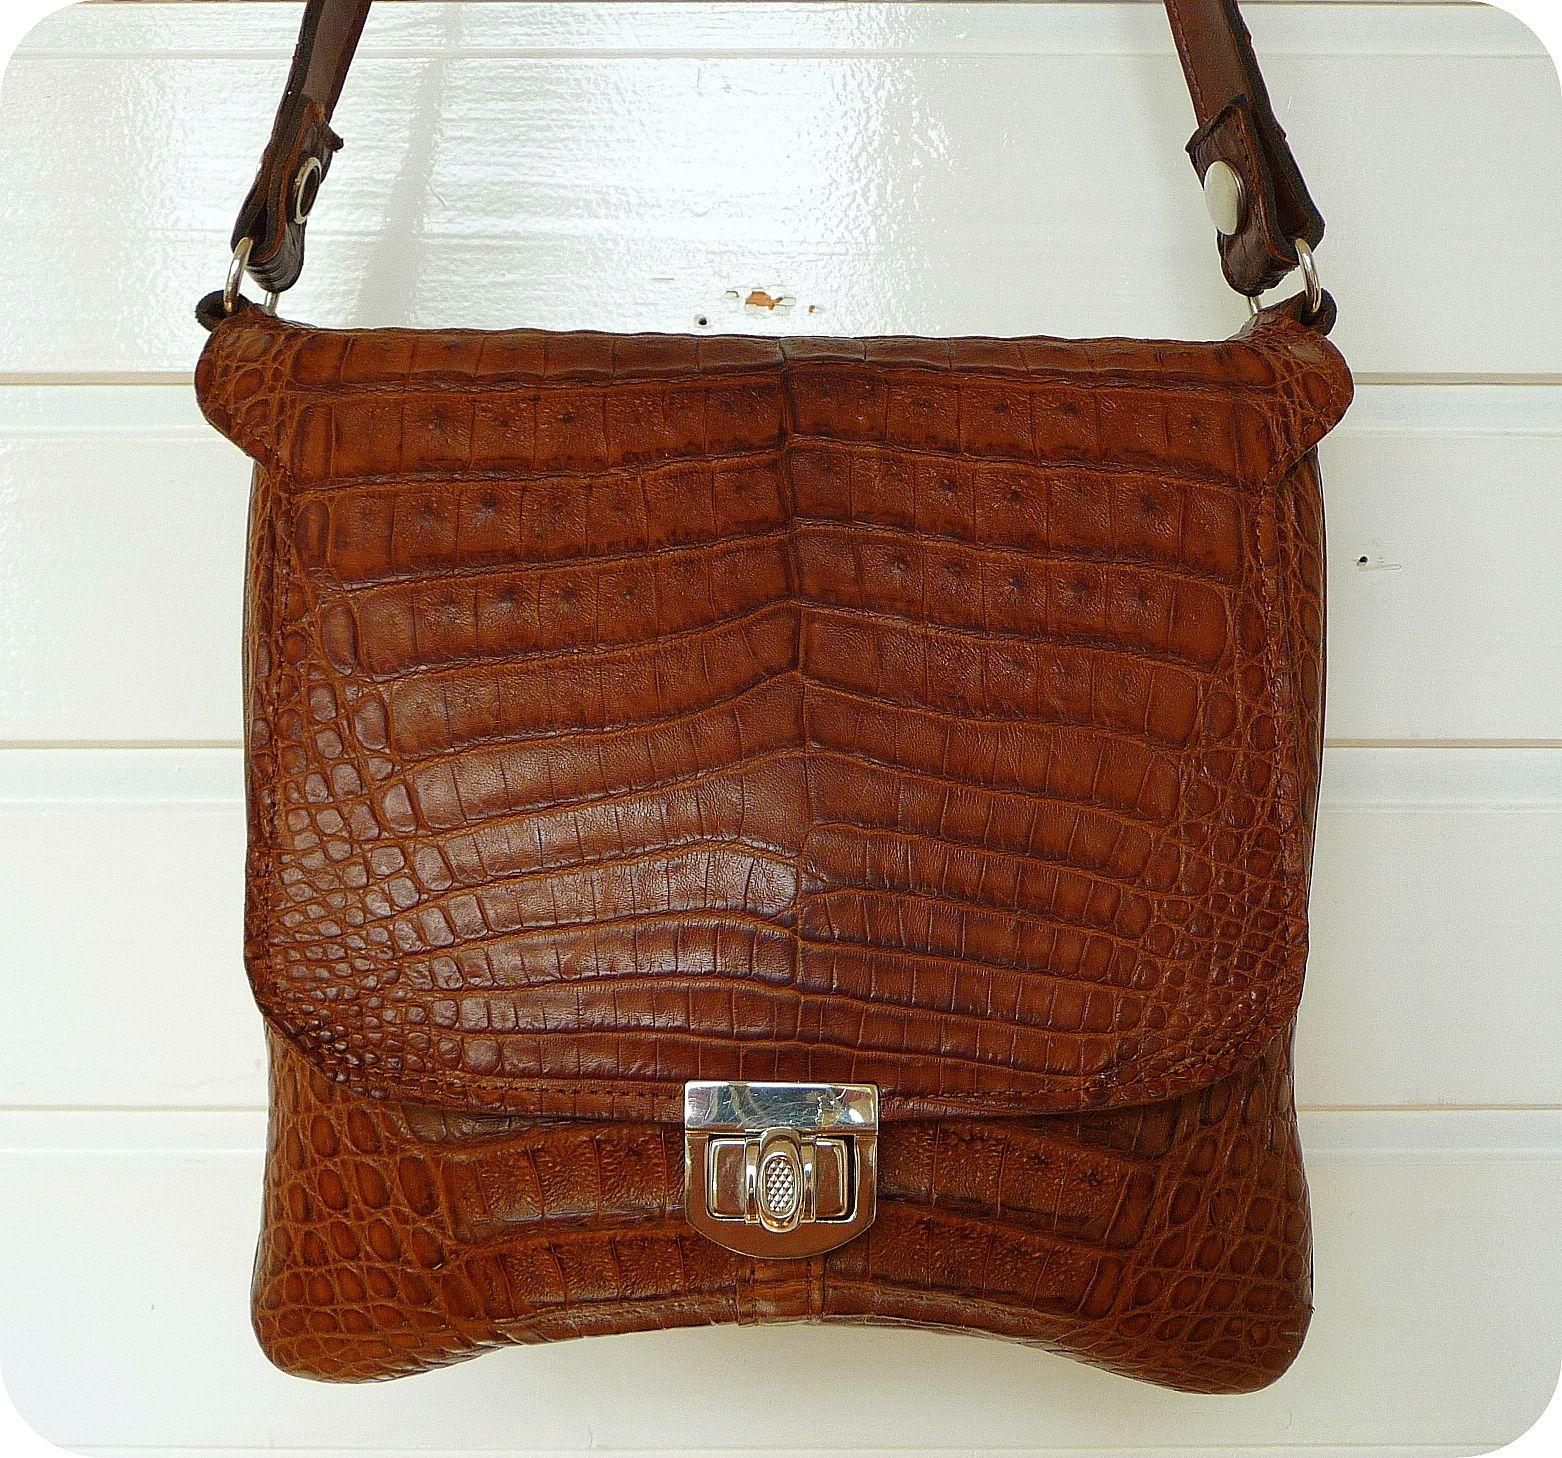 Vintage Leder Schultertasche Kroko 50er  http://www.ebay.de/itm/111673555544?ssPageName=STRK:MESELX:IT&_trksid=p3984.m1555.l2649